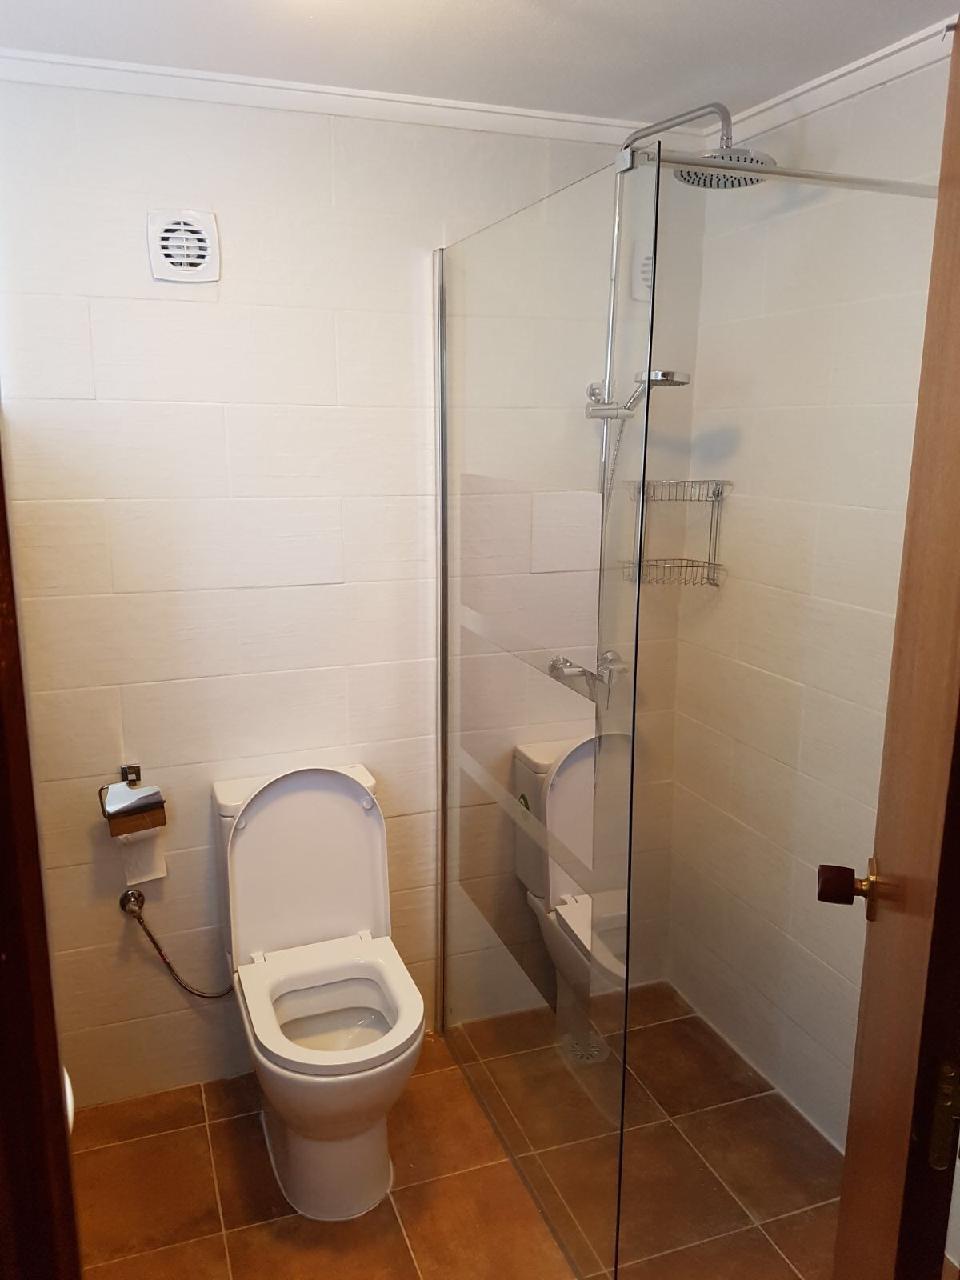 Appartement de vacances Sonnige 3.5 Zi-Wohnung am Meer (1026876), Torrevieja, Costa Blanca, Valence, Espagne, image 17